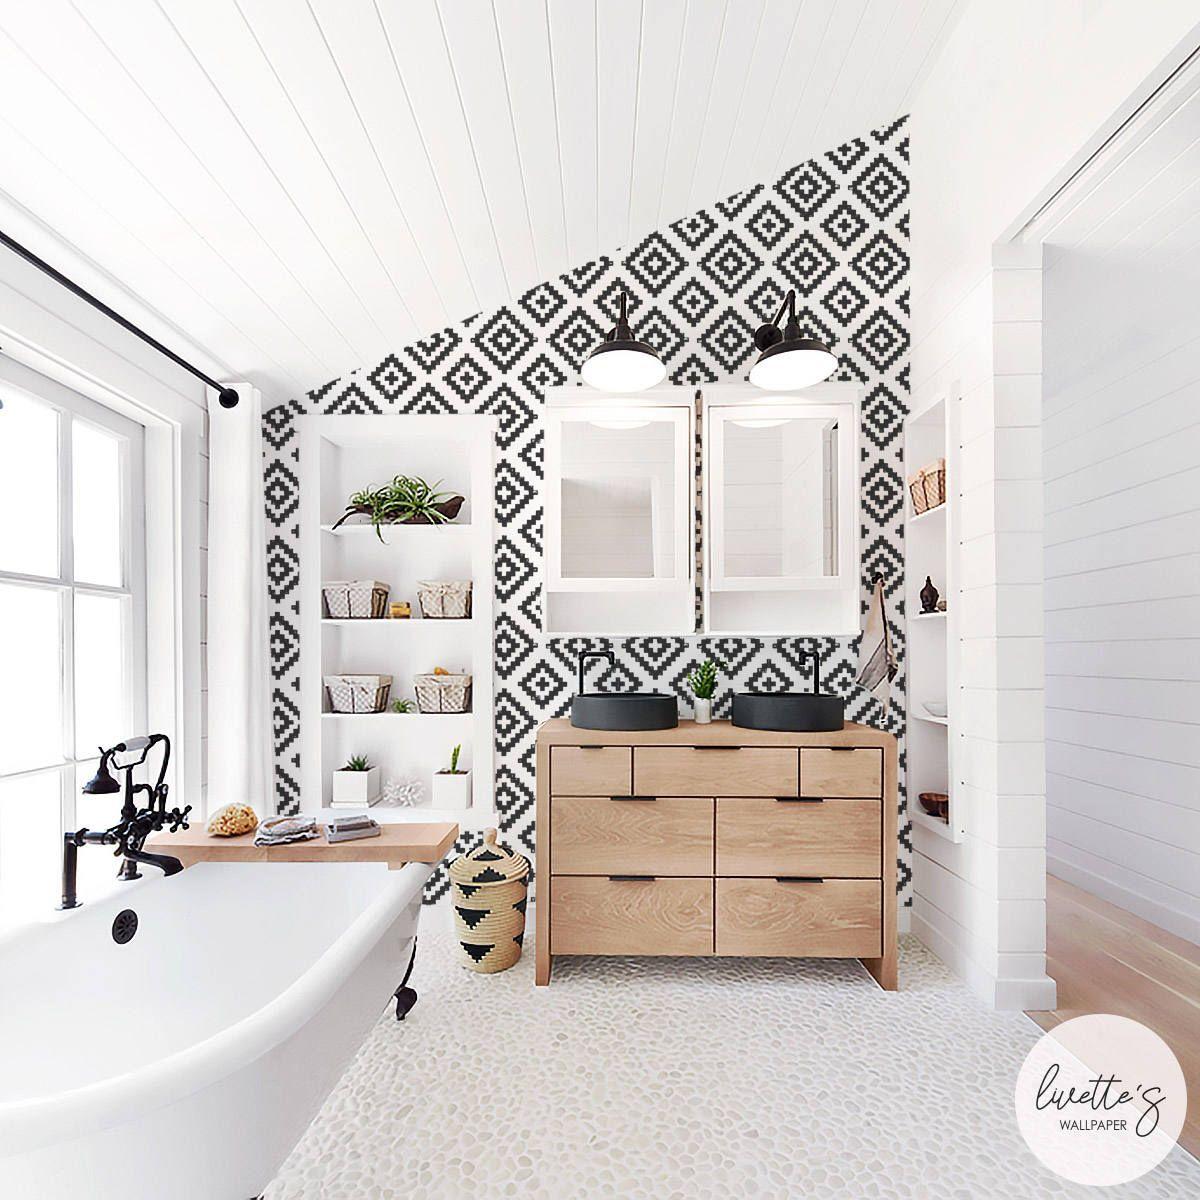 Scandinavian Pattern Removable Wallpaper Geometric Self Adhesive Or Traditional Wallpaper By Bathroom Interior Design Bathrooms Remodel Home Interior Design